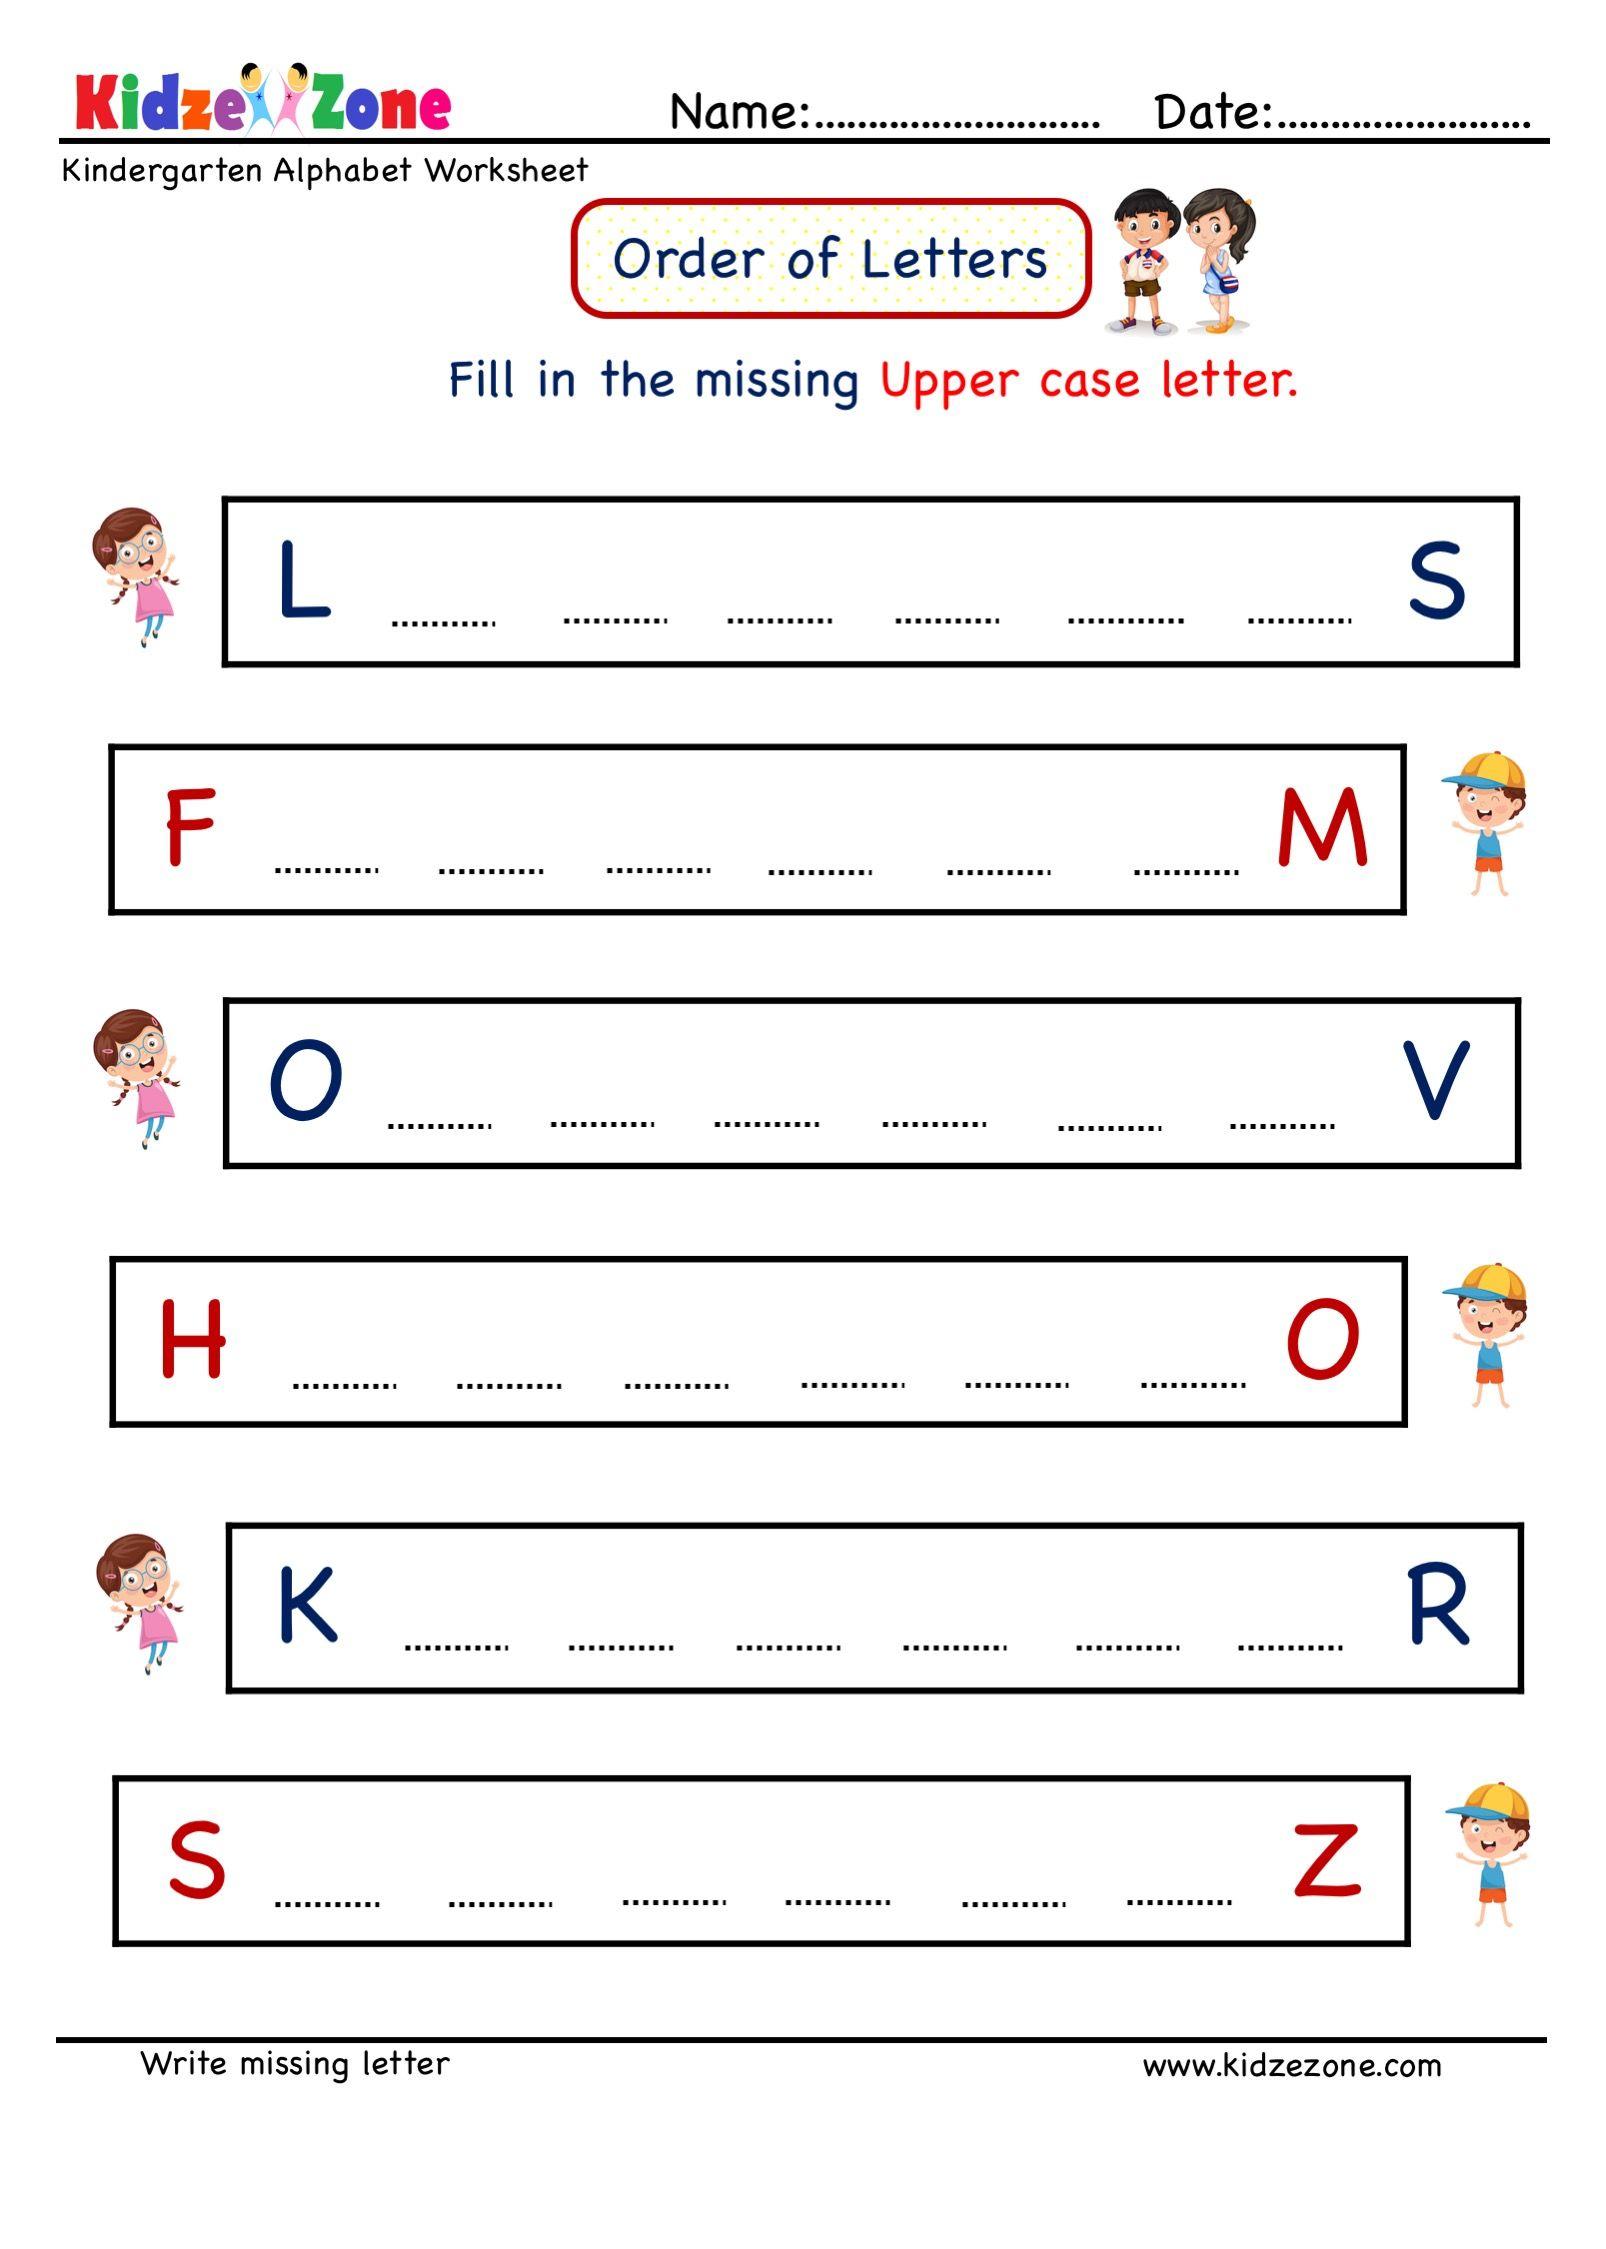 Kindergarten Fill Missing Upper Case Letter In